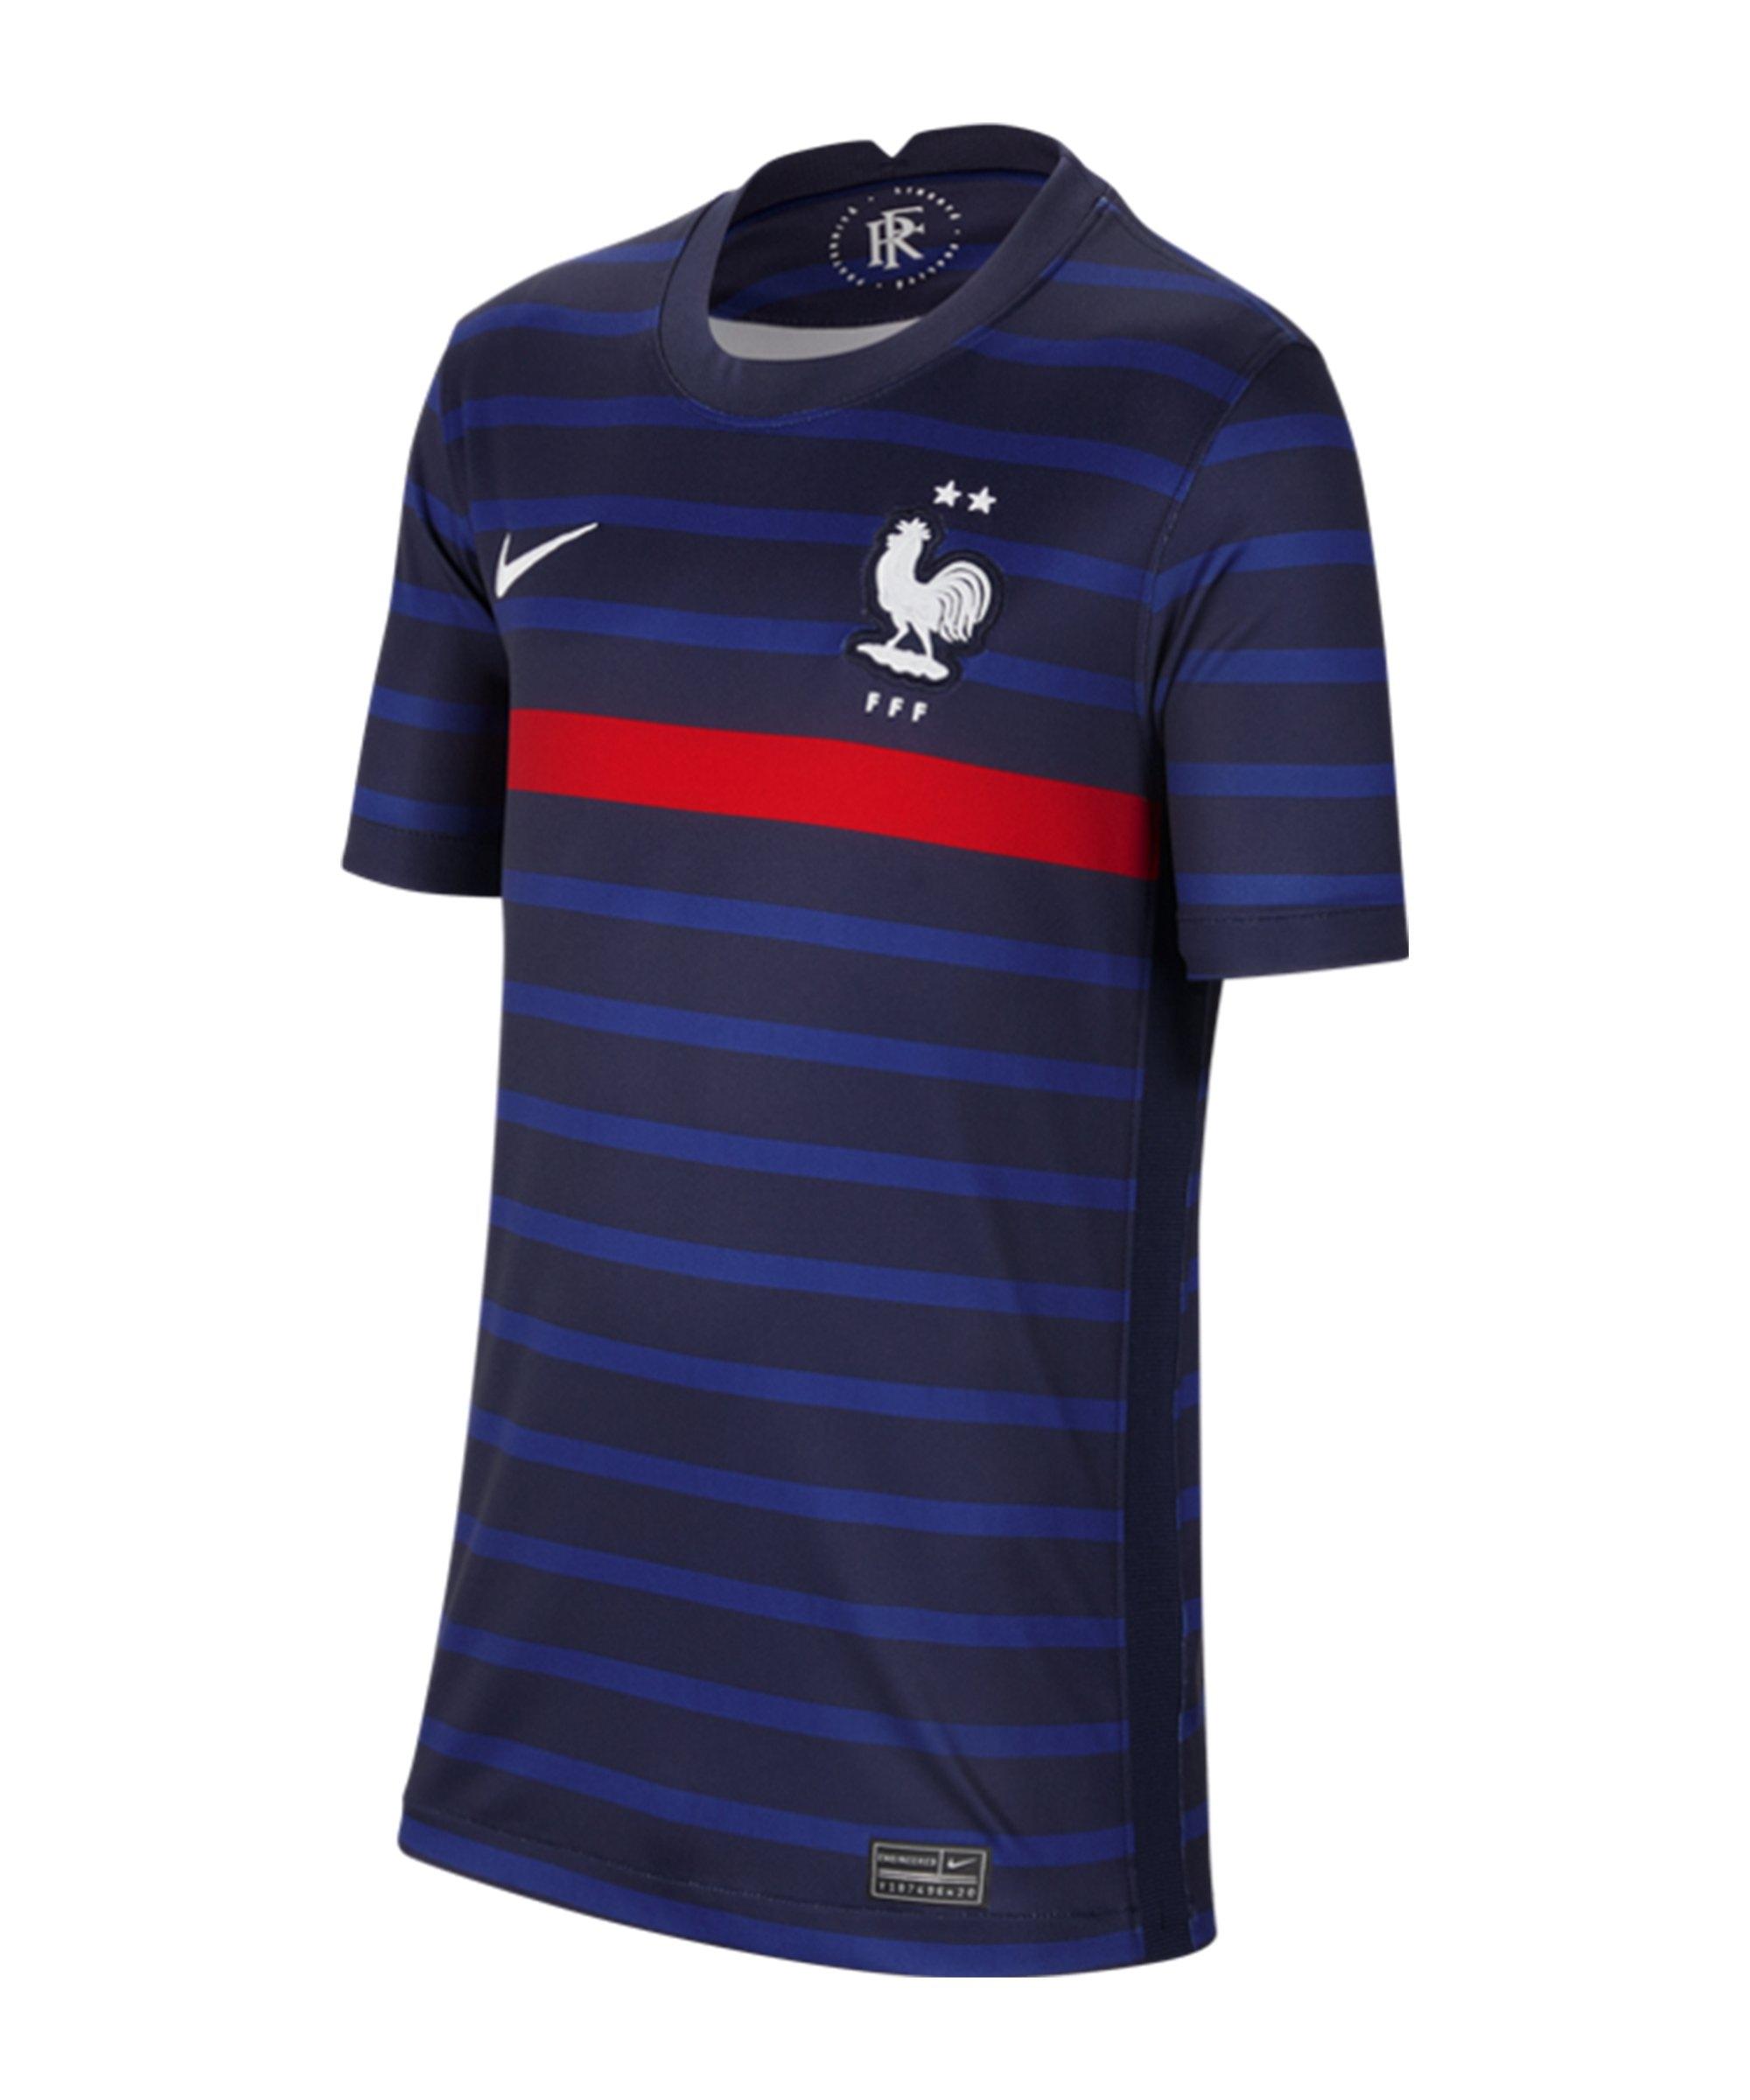 Nike Frankreich Trikot Home EM 2020 Kids F498 - blau